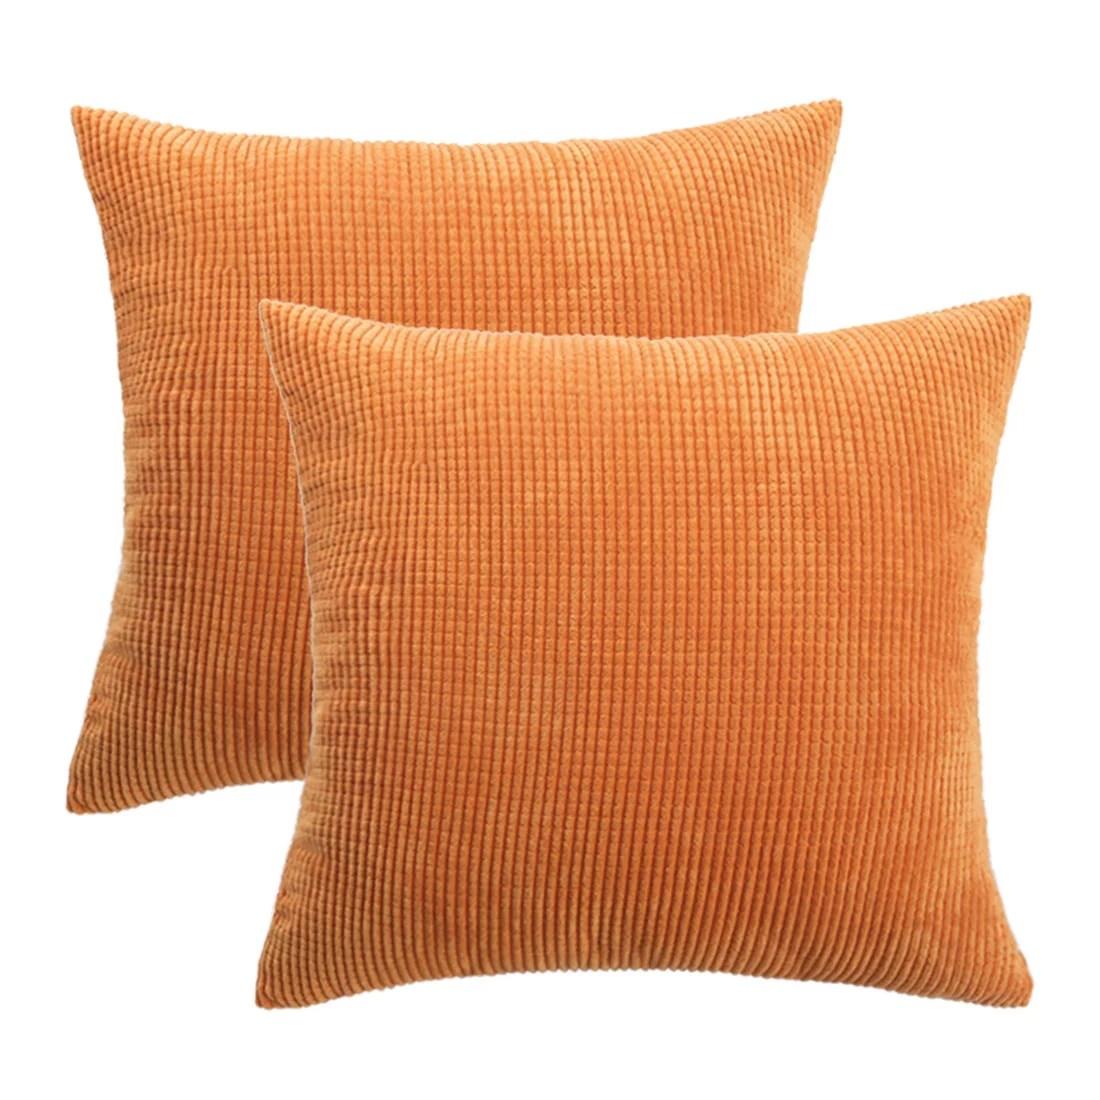 cushion covers stripe decoration throw pillow case 26 x 26 inch orange 2pcs